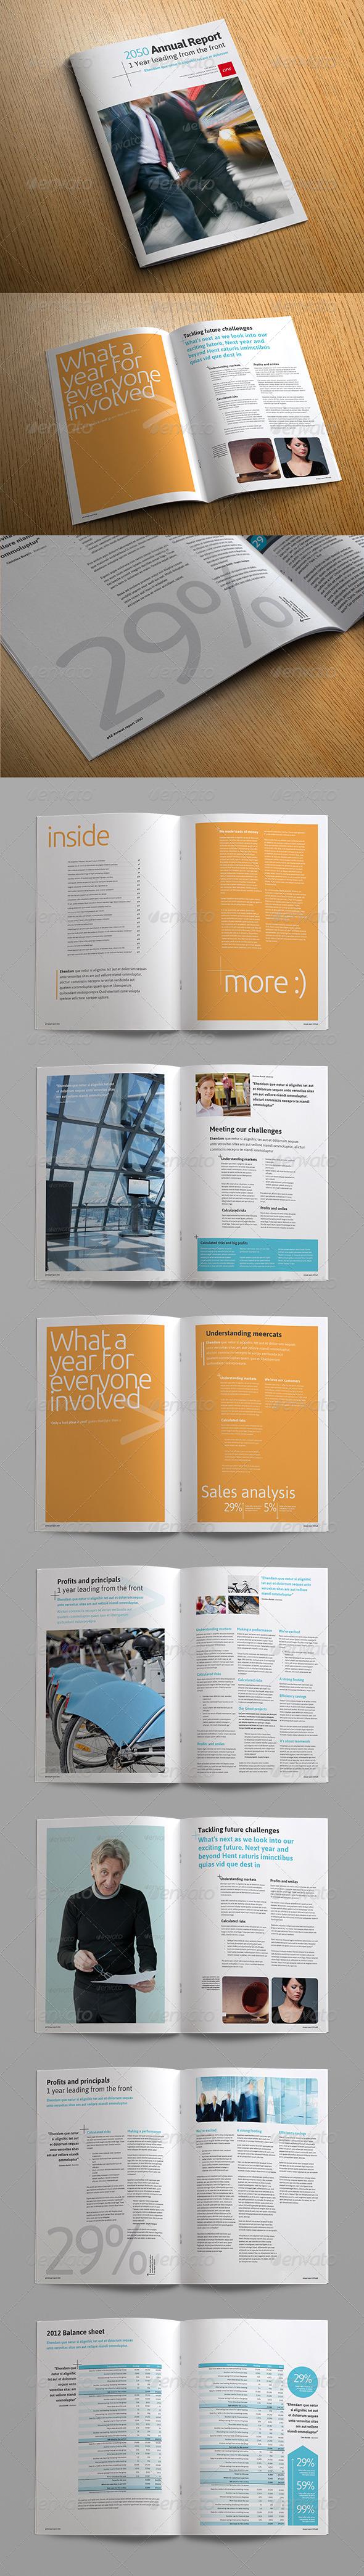 Annual Report / Corporate Brochure - Informational Brochures